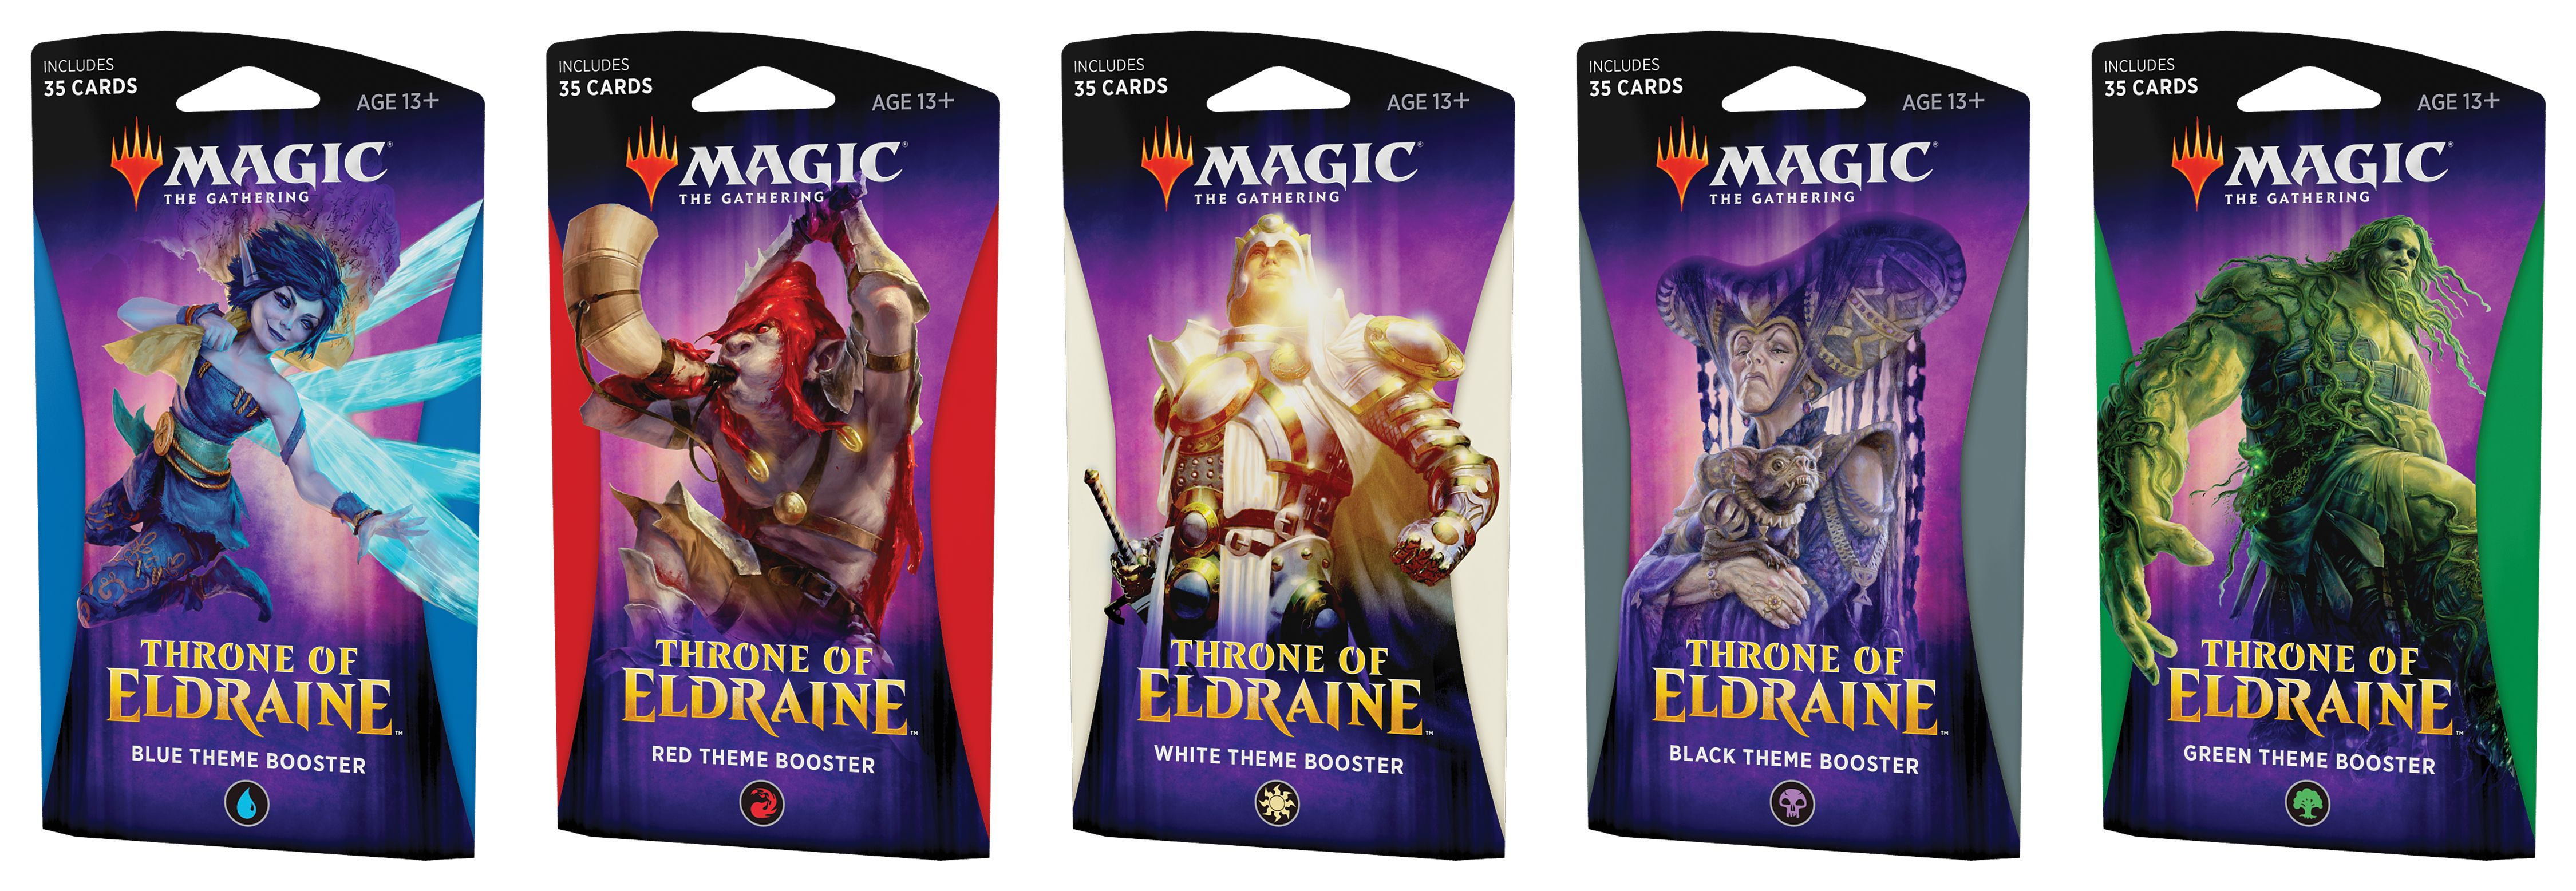 Theme Boosters Eldraine ELD Magic the Gathering Wizards of the Coast | Jeux Toulon L'Atanière